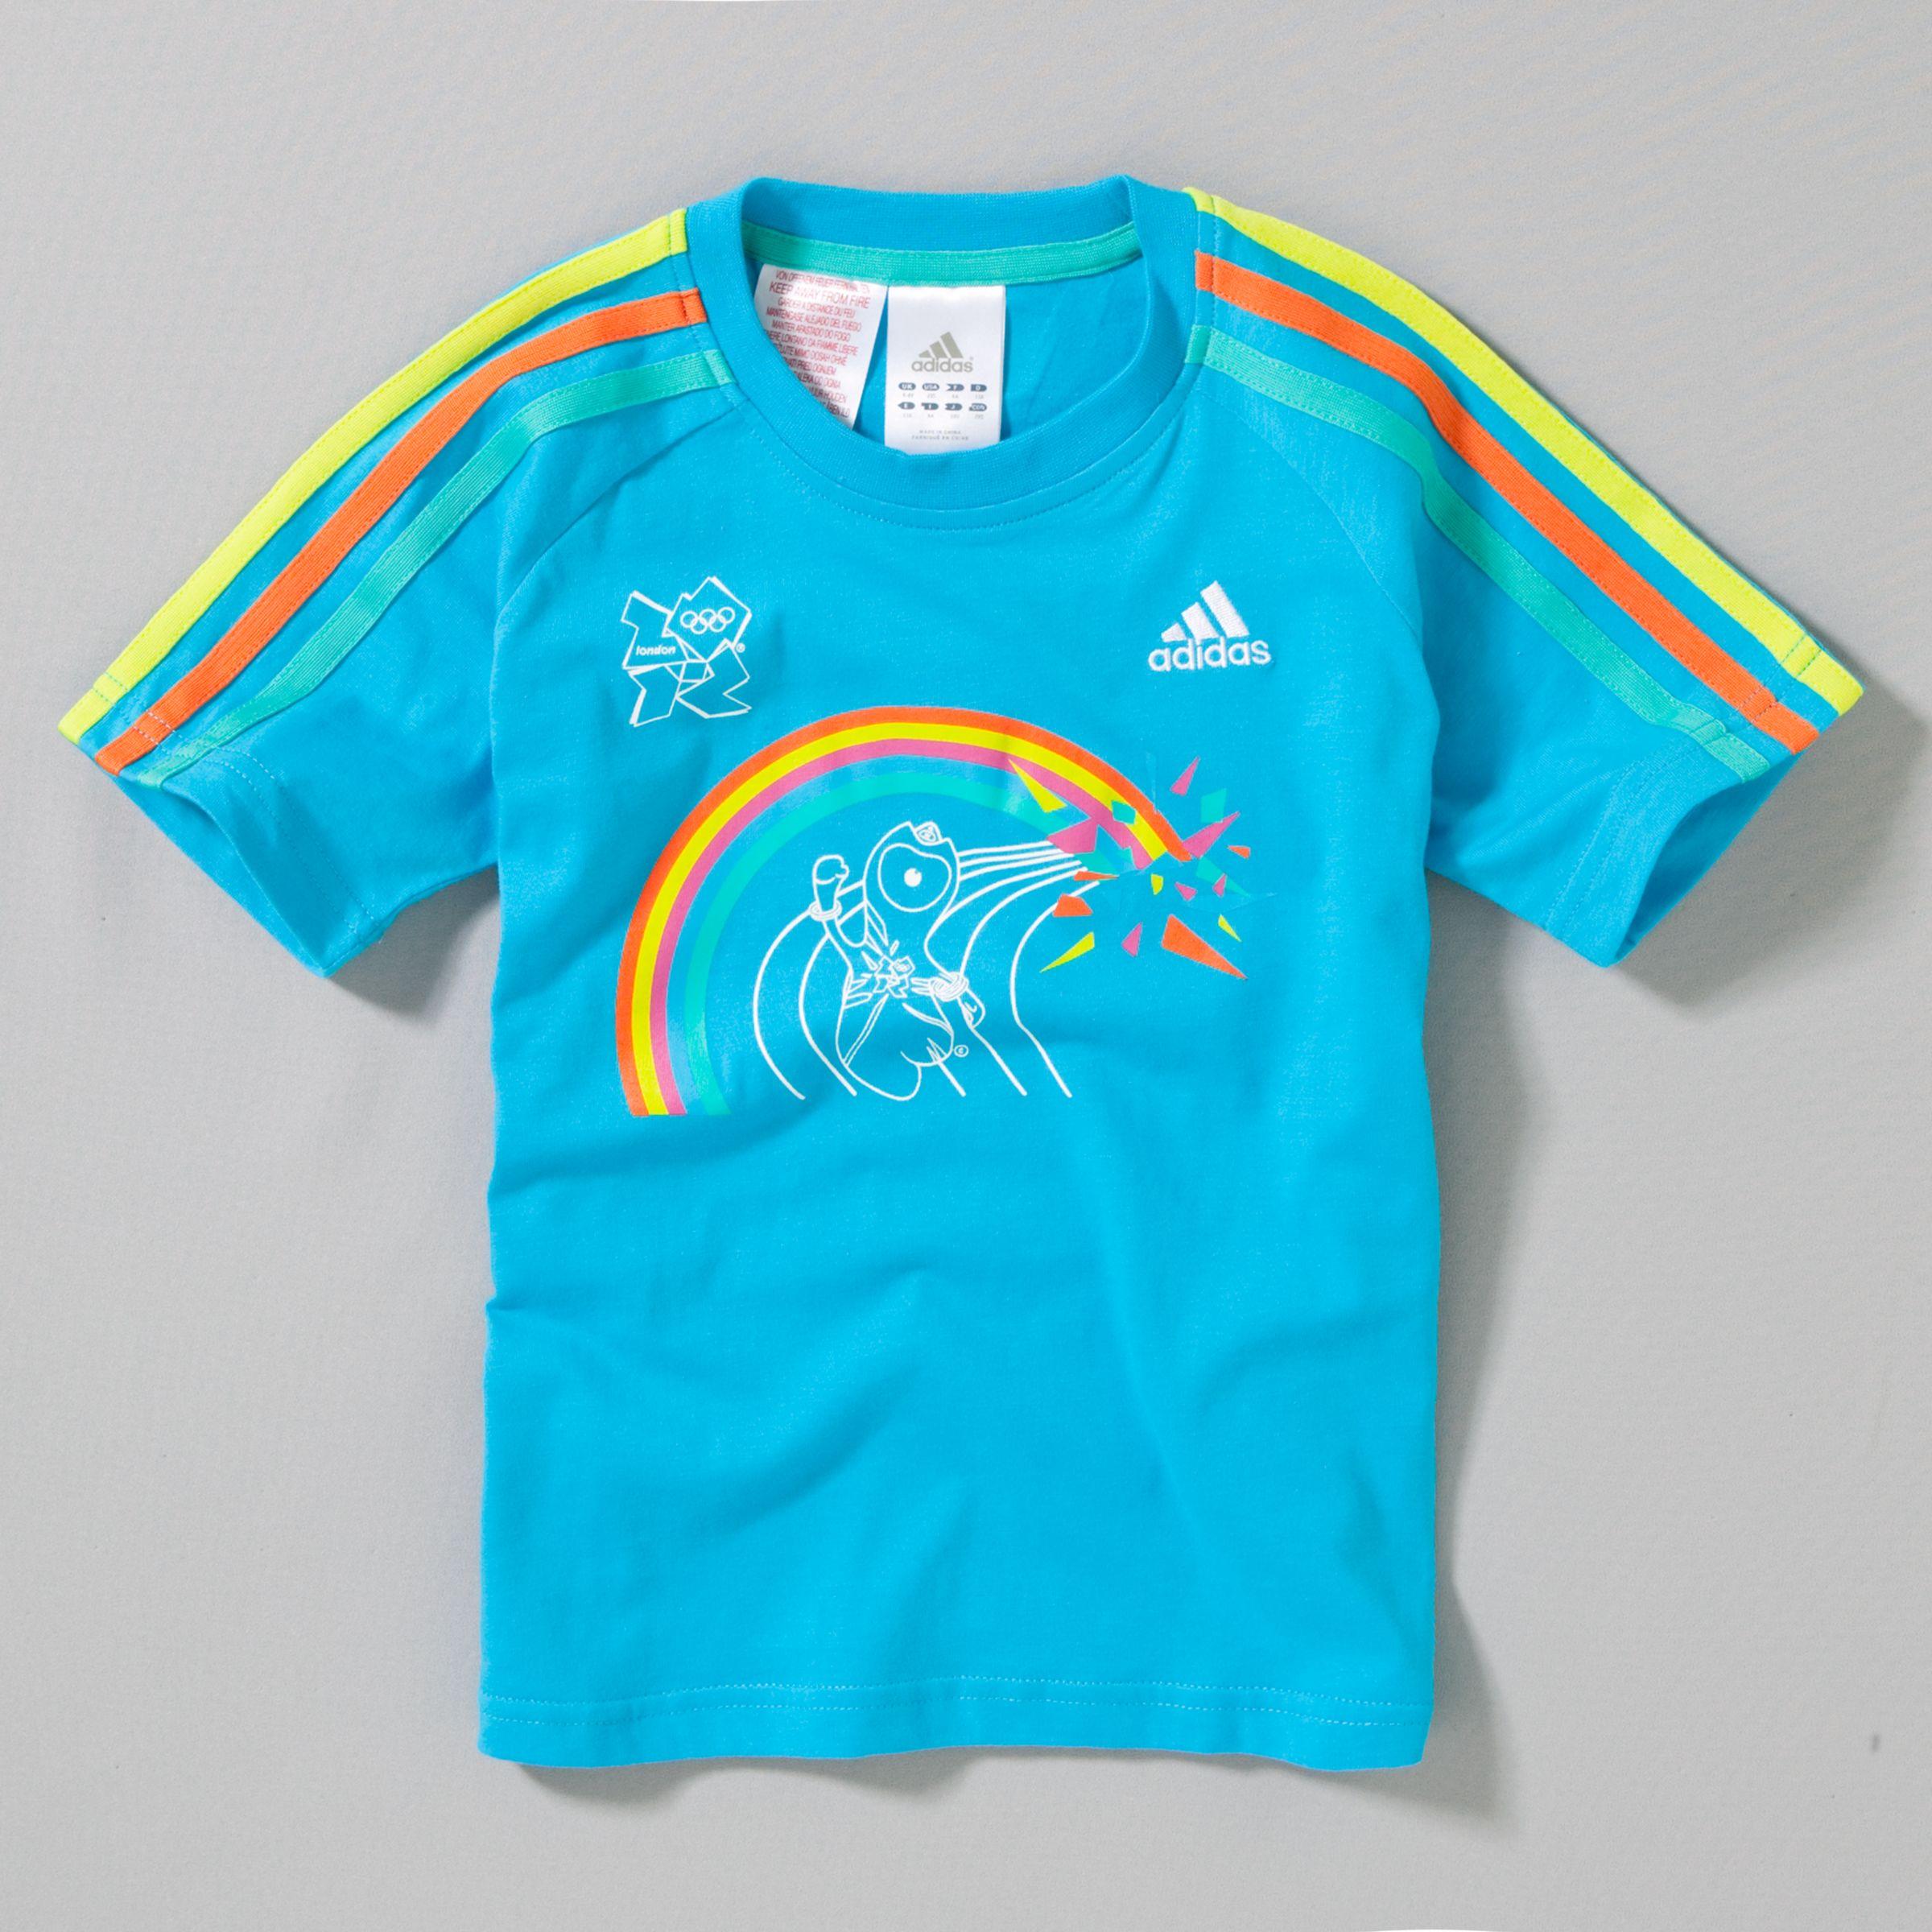 London 2012 Wenlock Rainbow T-Shirt, Pure